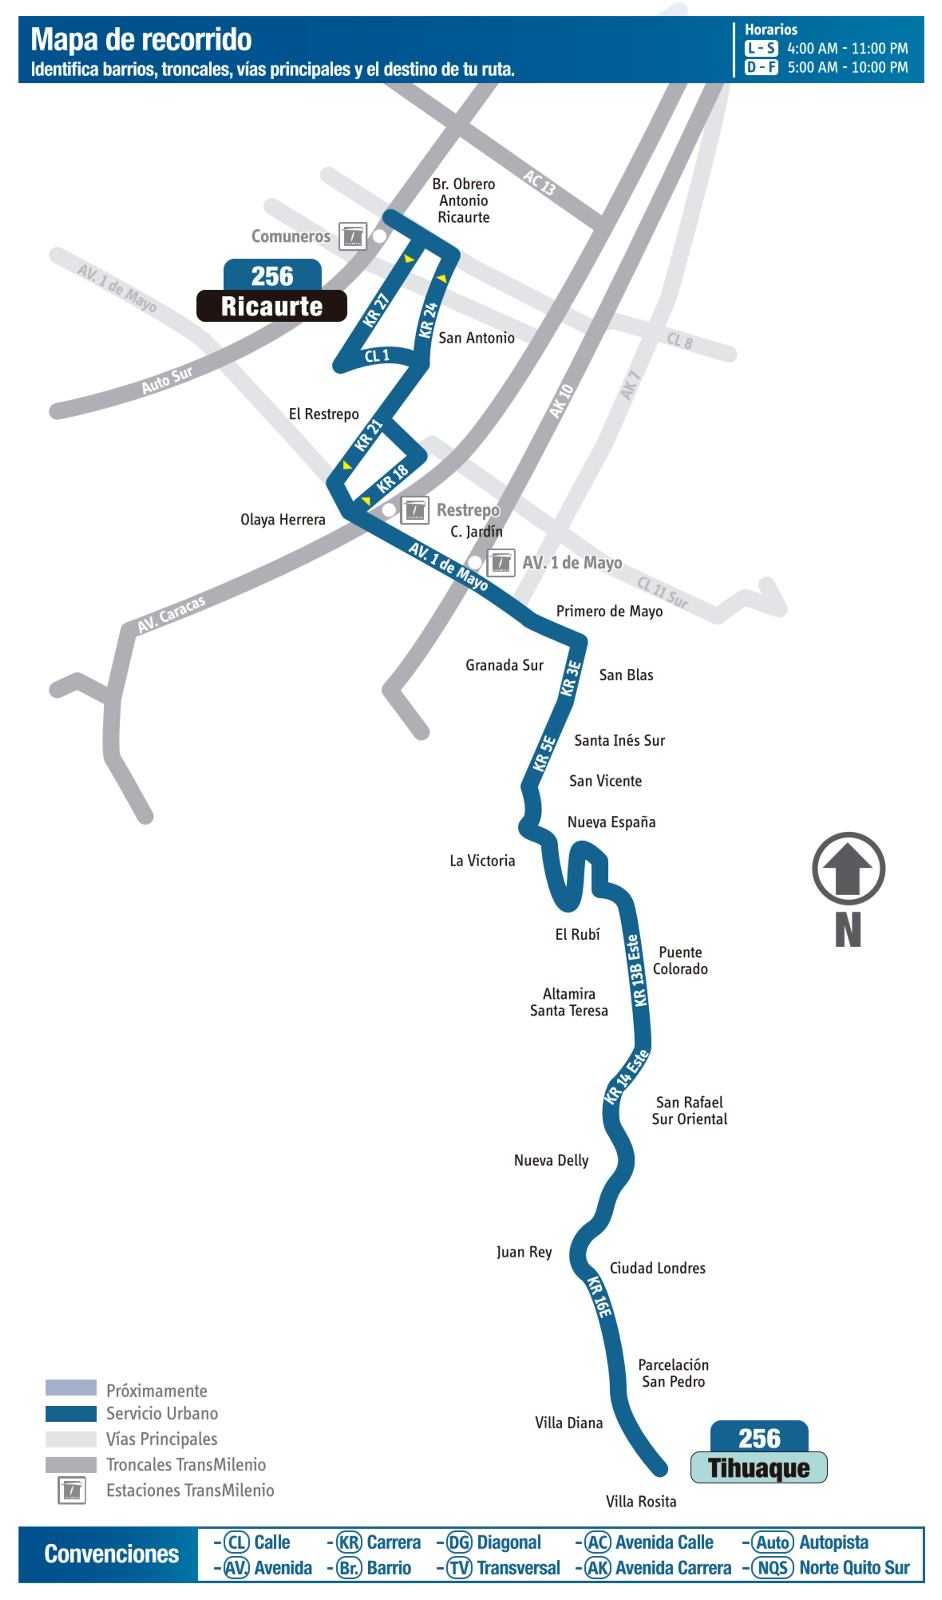 Ruta SITP: 256 Tihuaque ↔ Ricaurte (mapa)